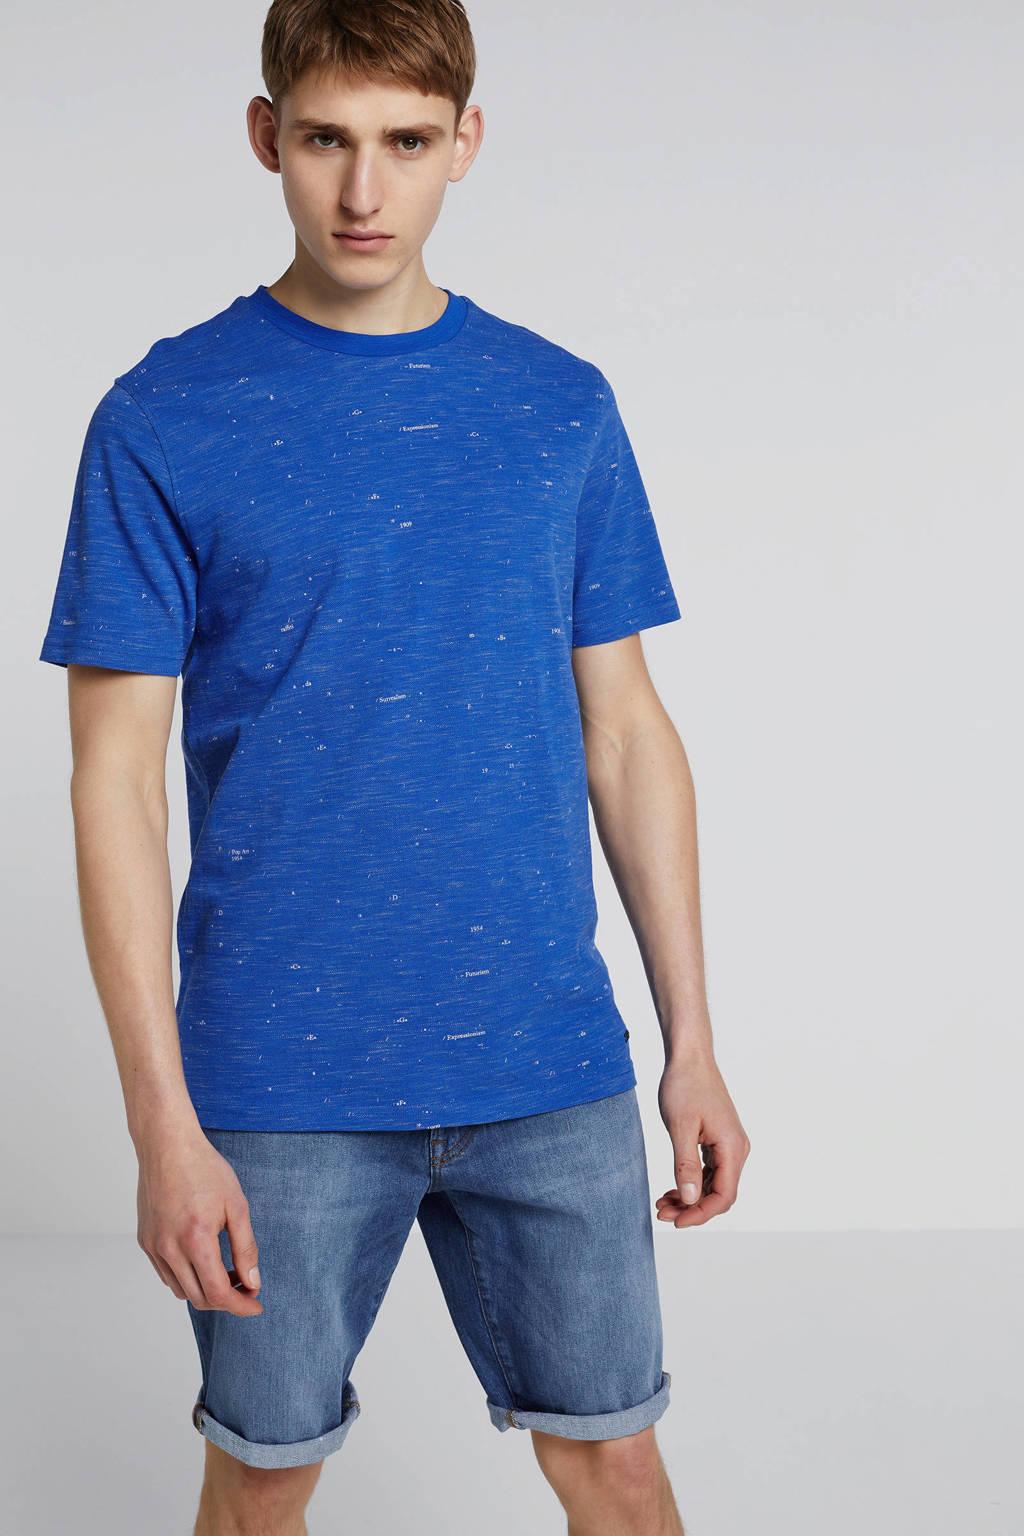 BOSS Casual regular fit jeans short 030 Maine, Medium blue